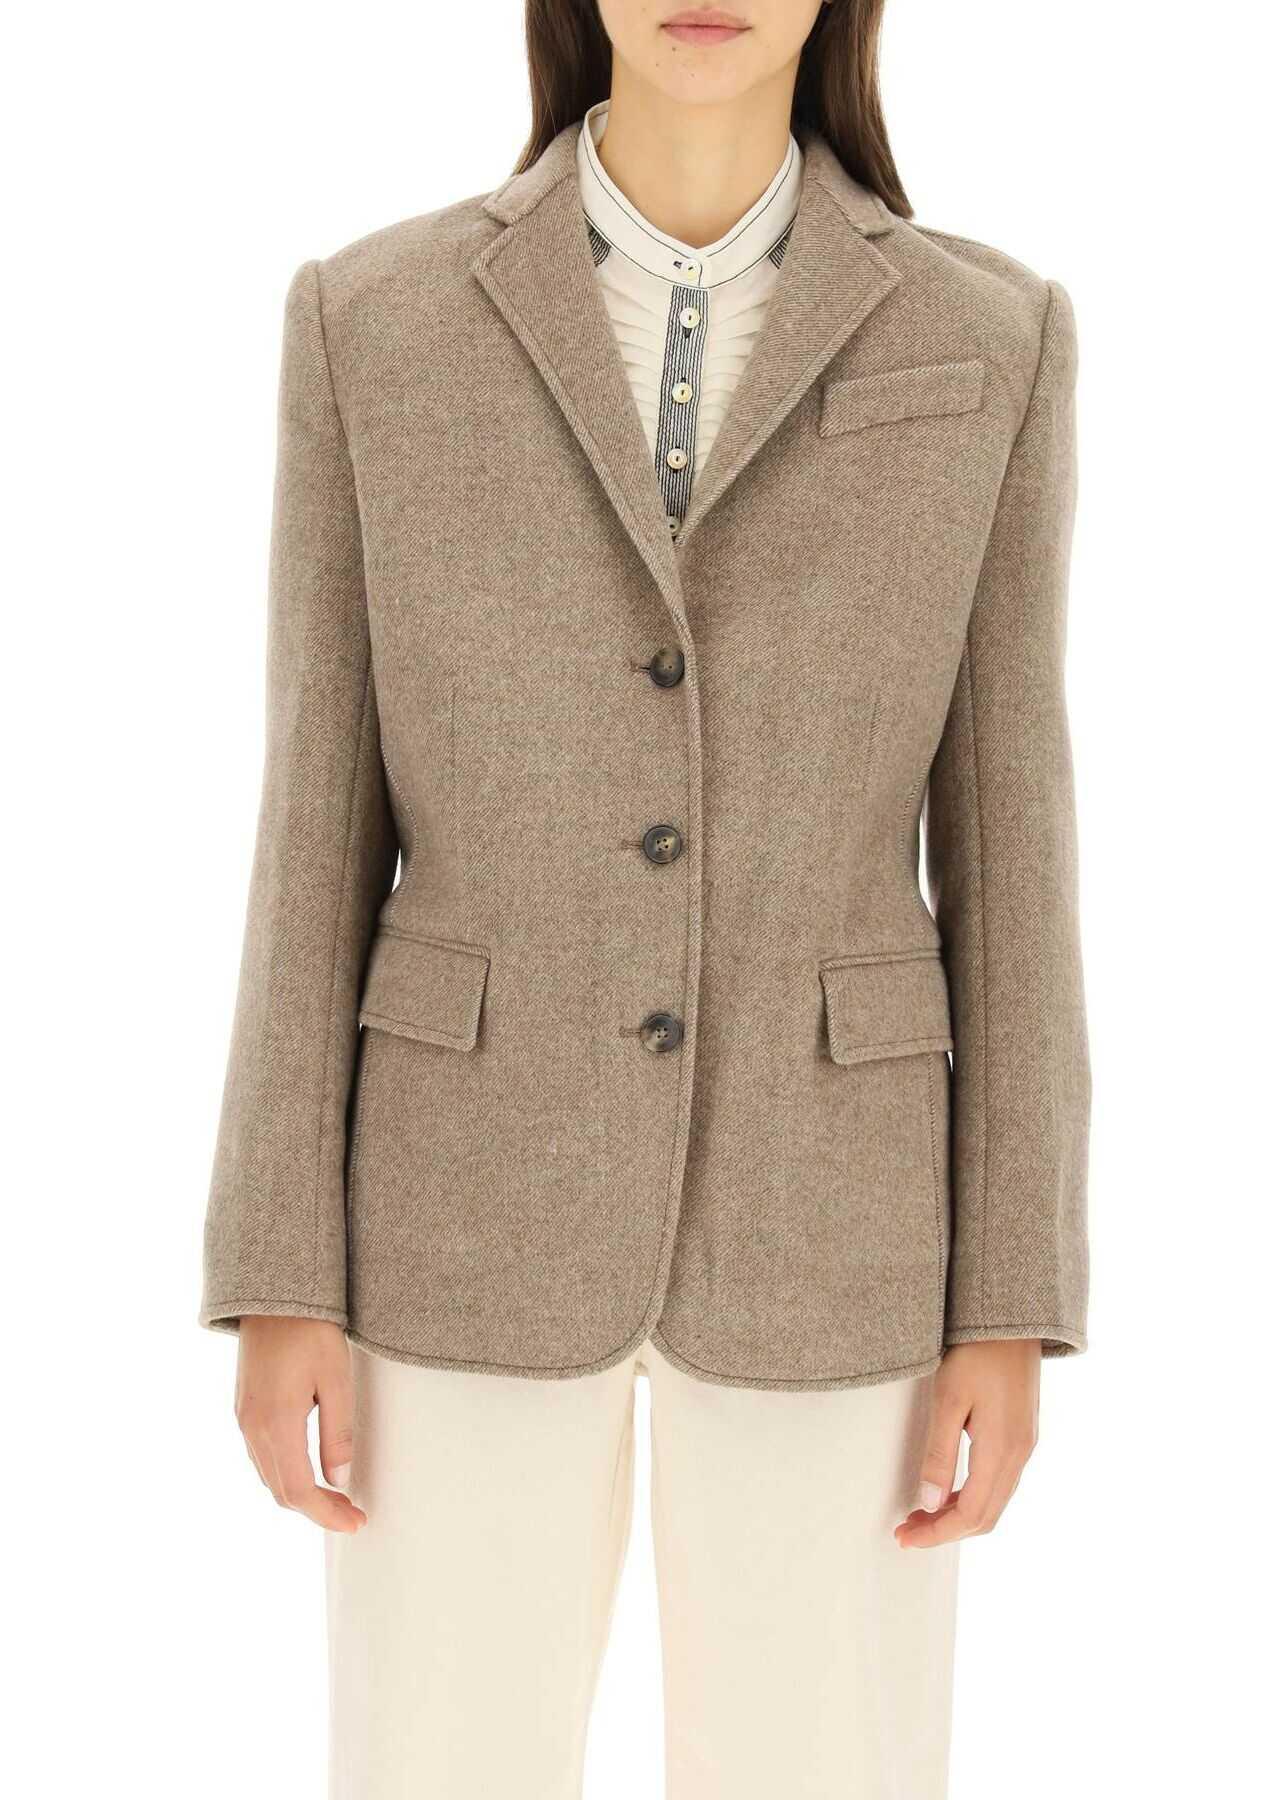 Tory Burch Wool Blazer 84314 ASHED MOCHA image0